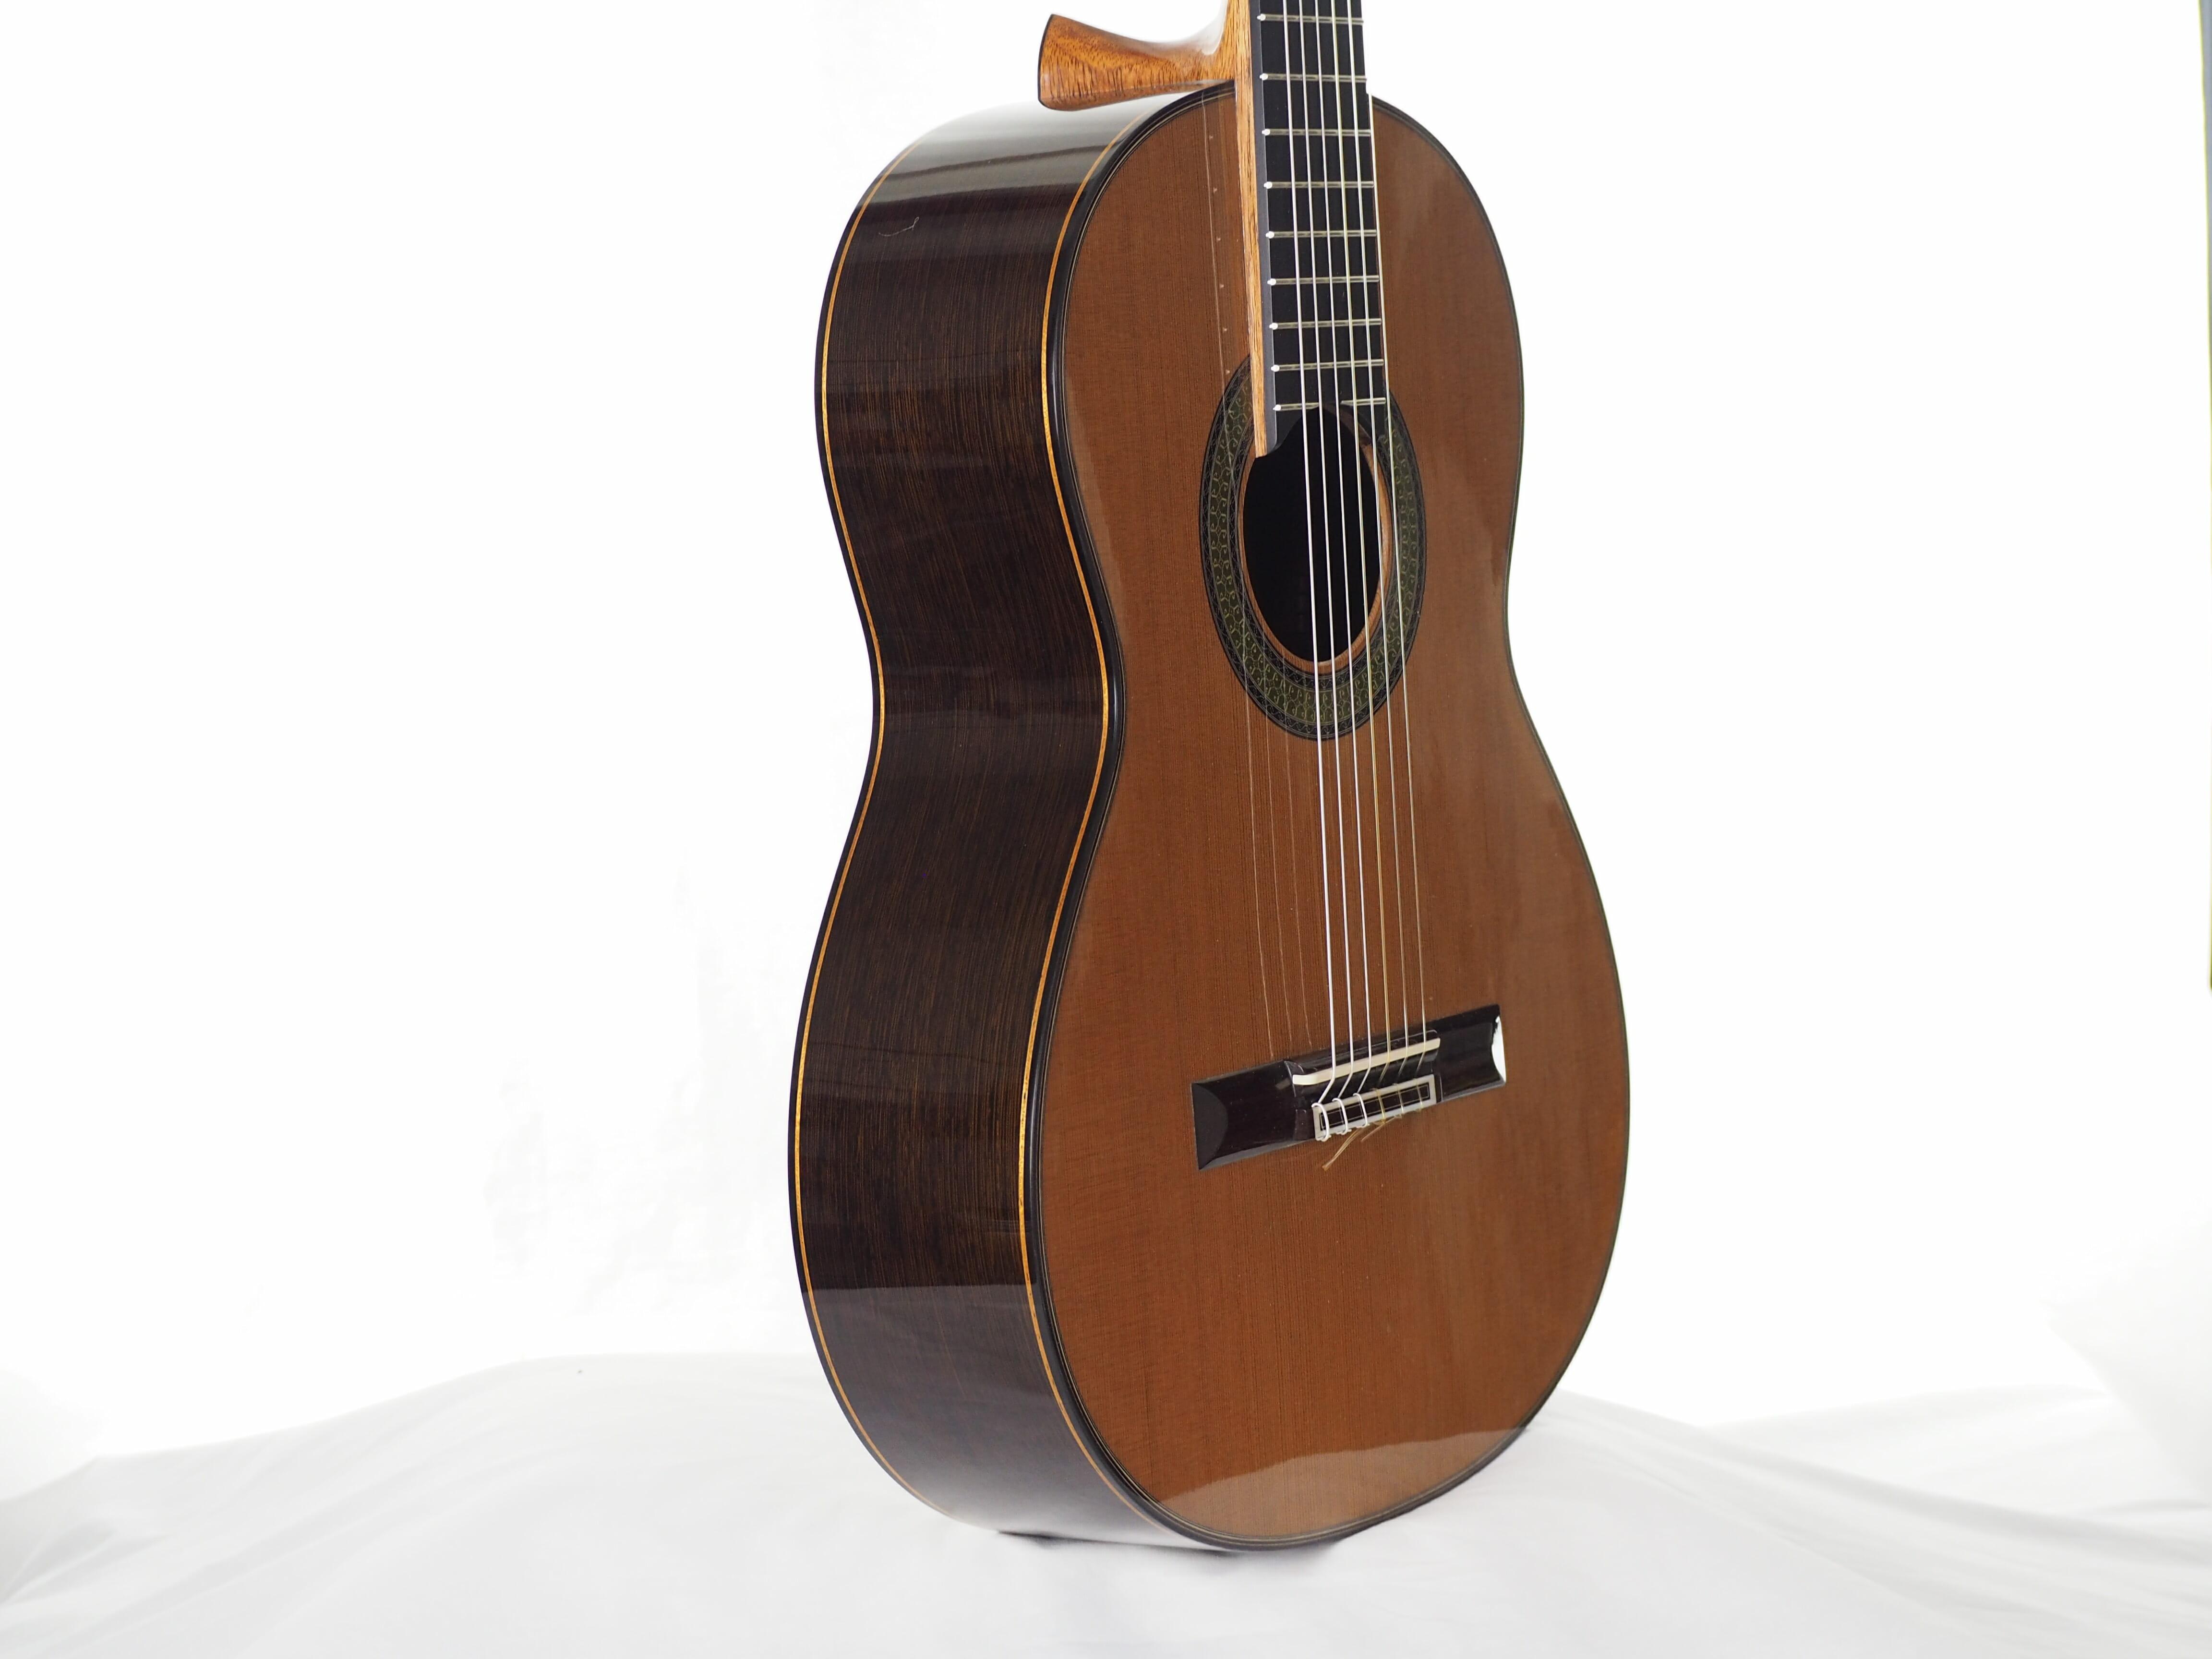 Reza Safavian guitare classique